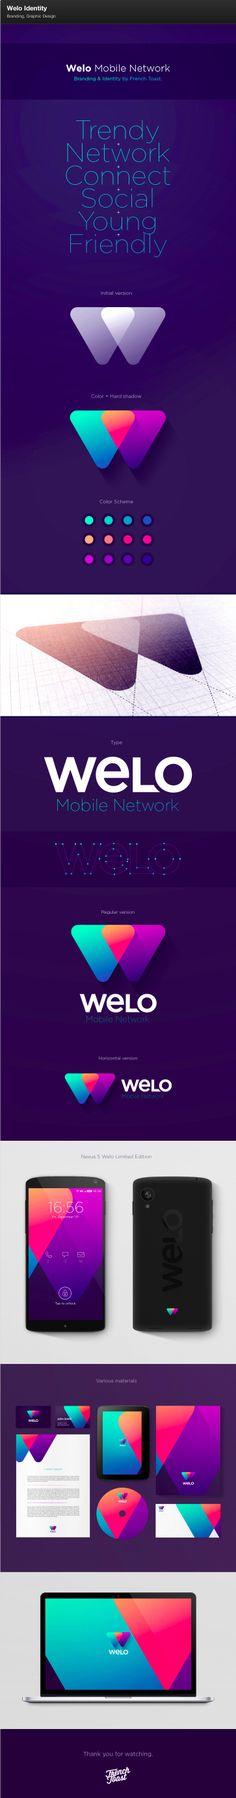 http://www.behance.net/frenchtoast welo / french toast creative / branding / brand identity / logo design